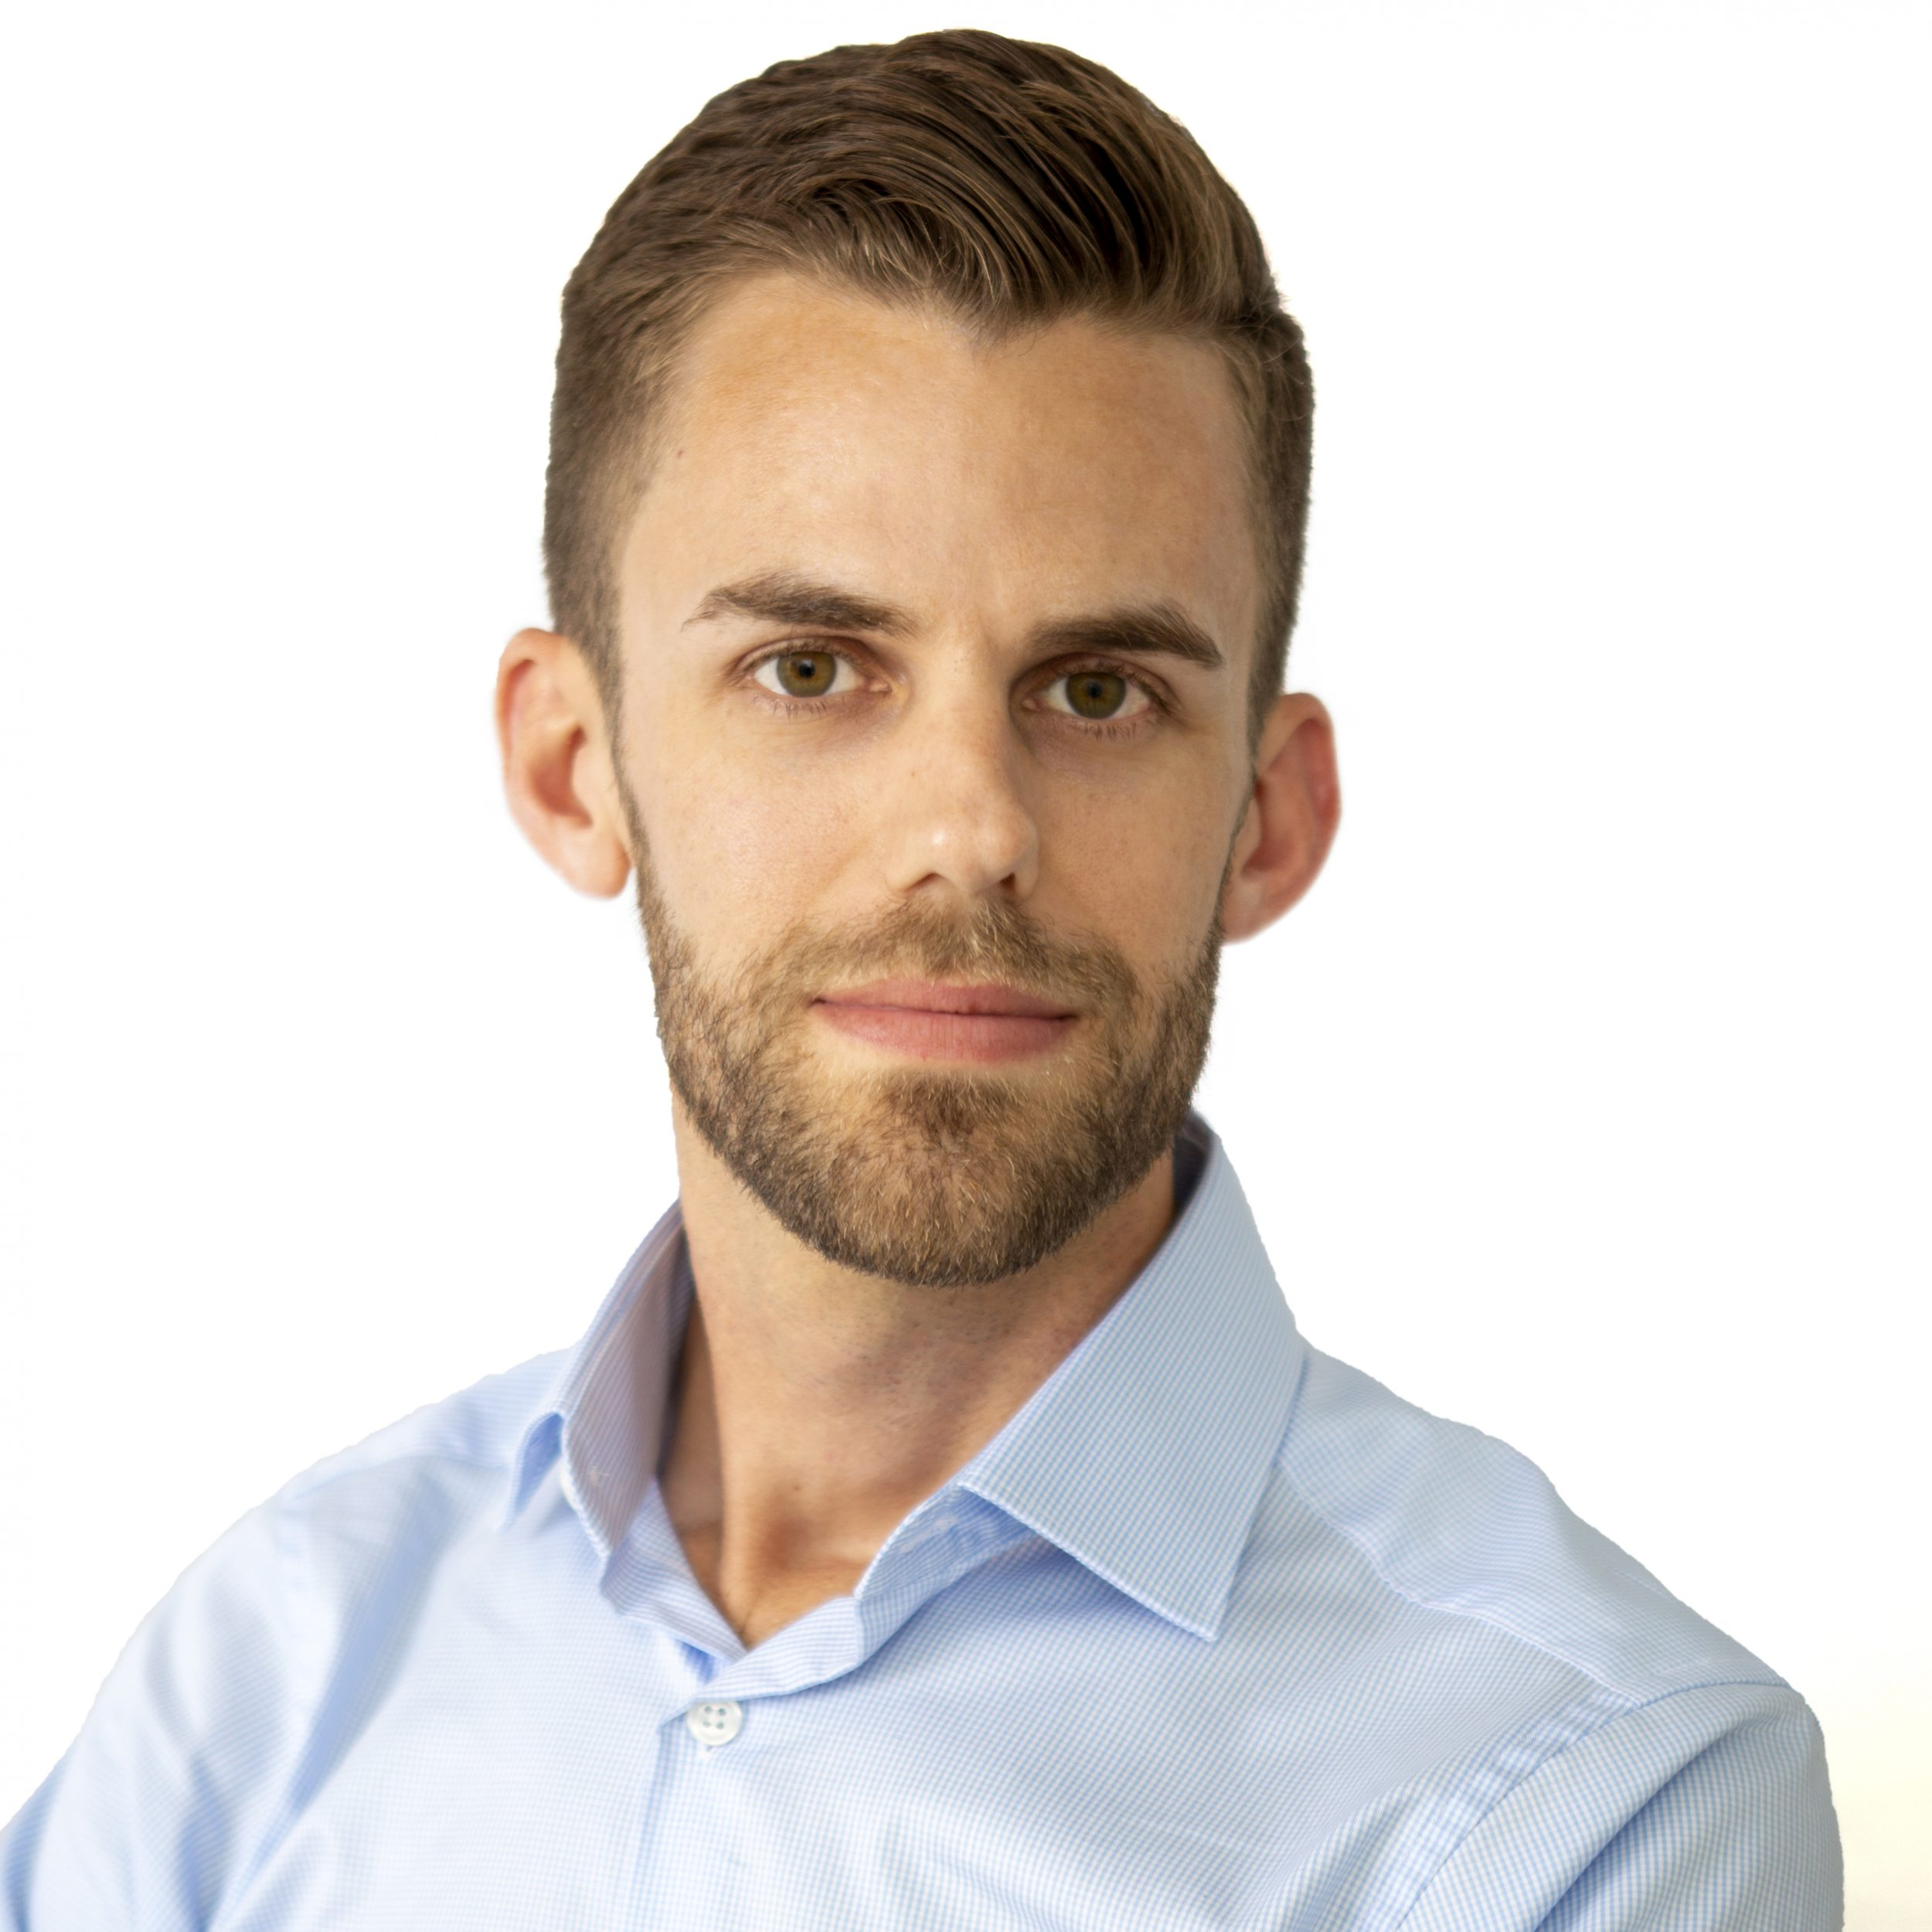 Kyle Grant